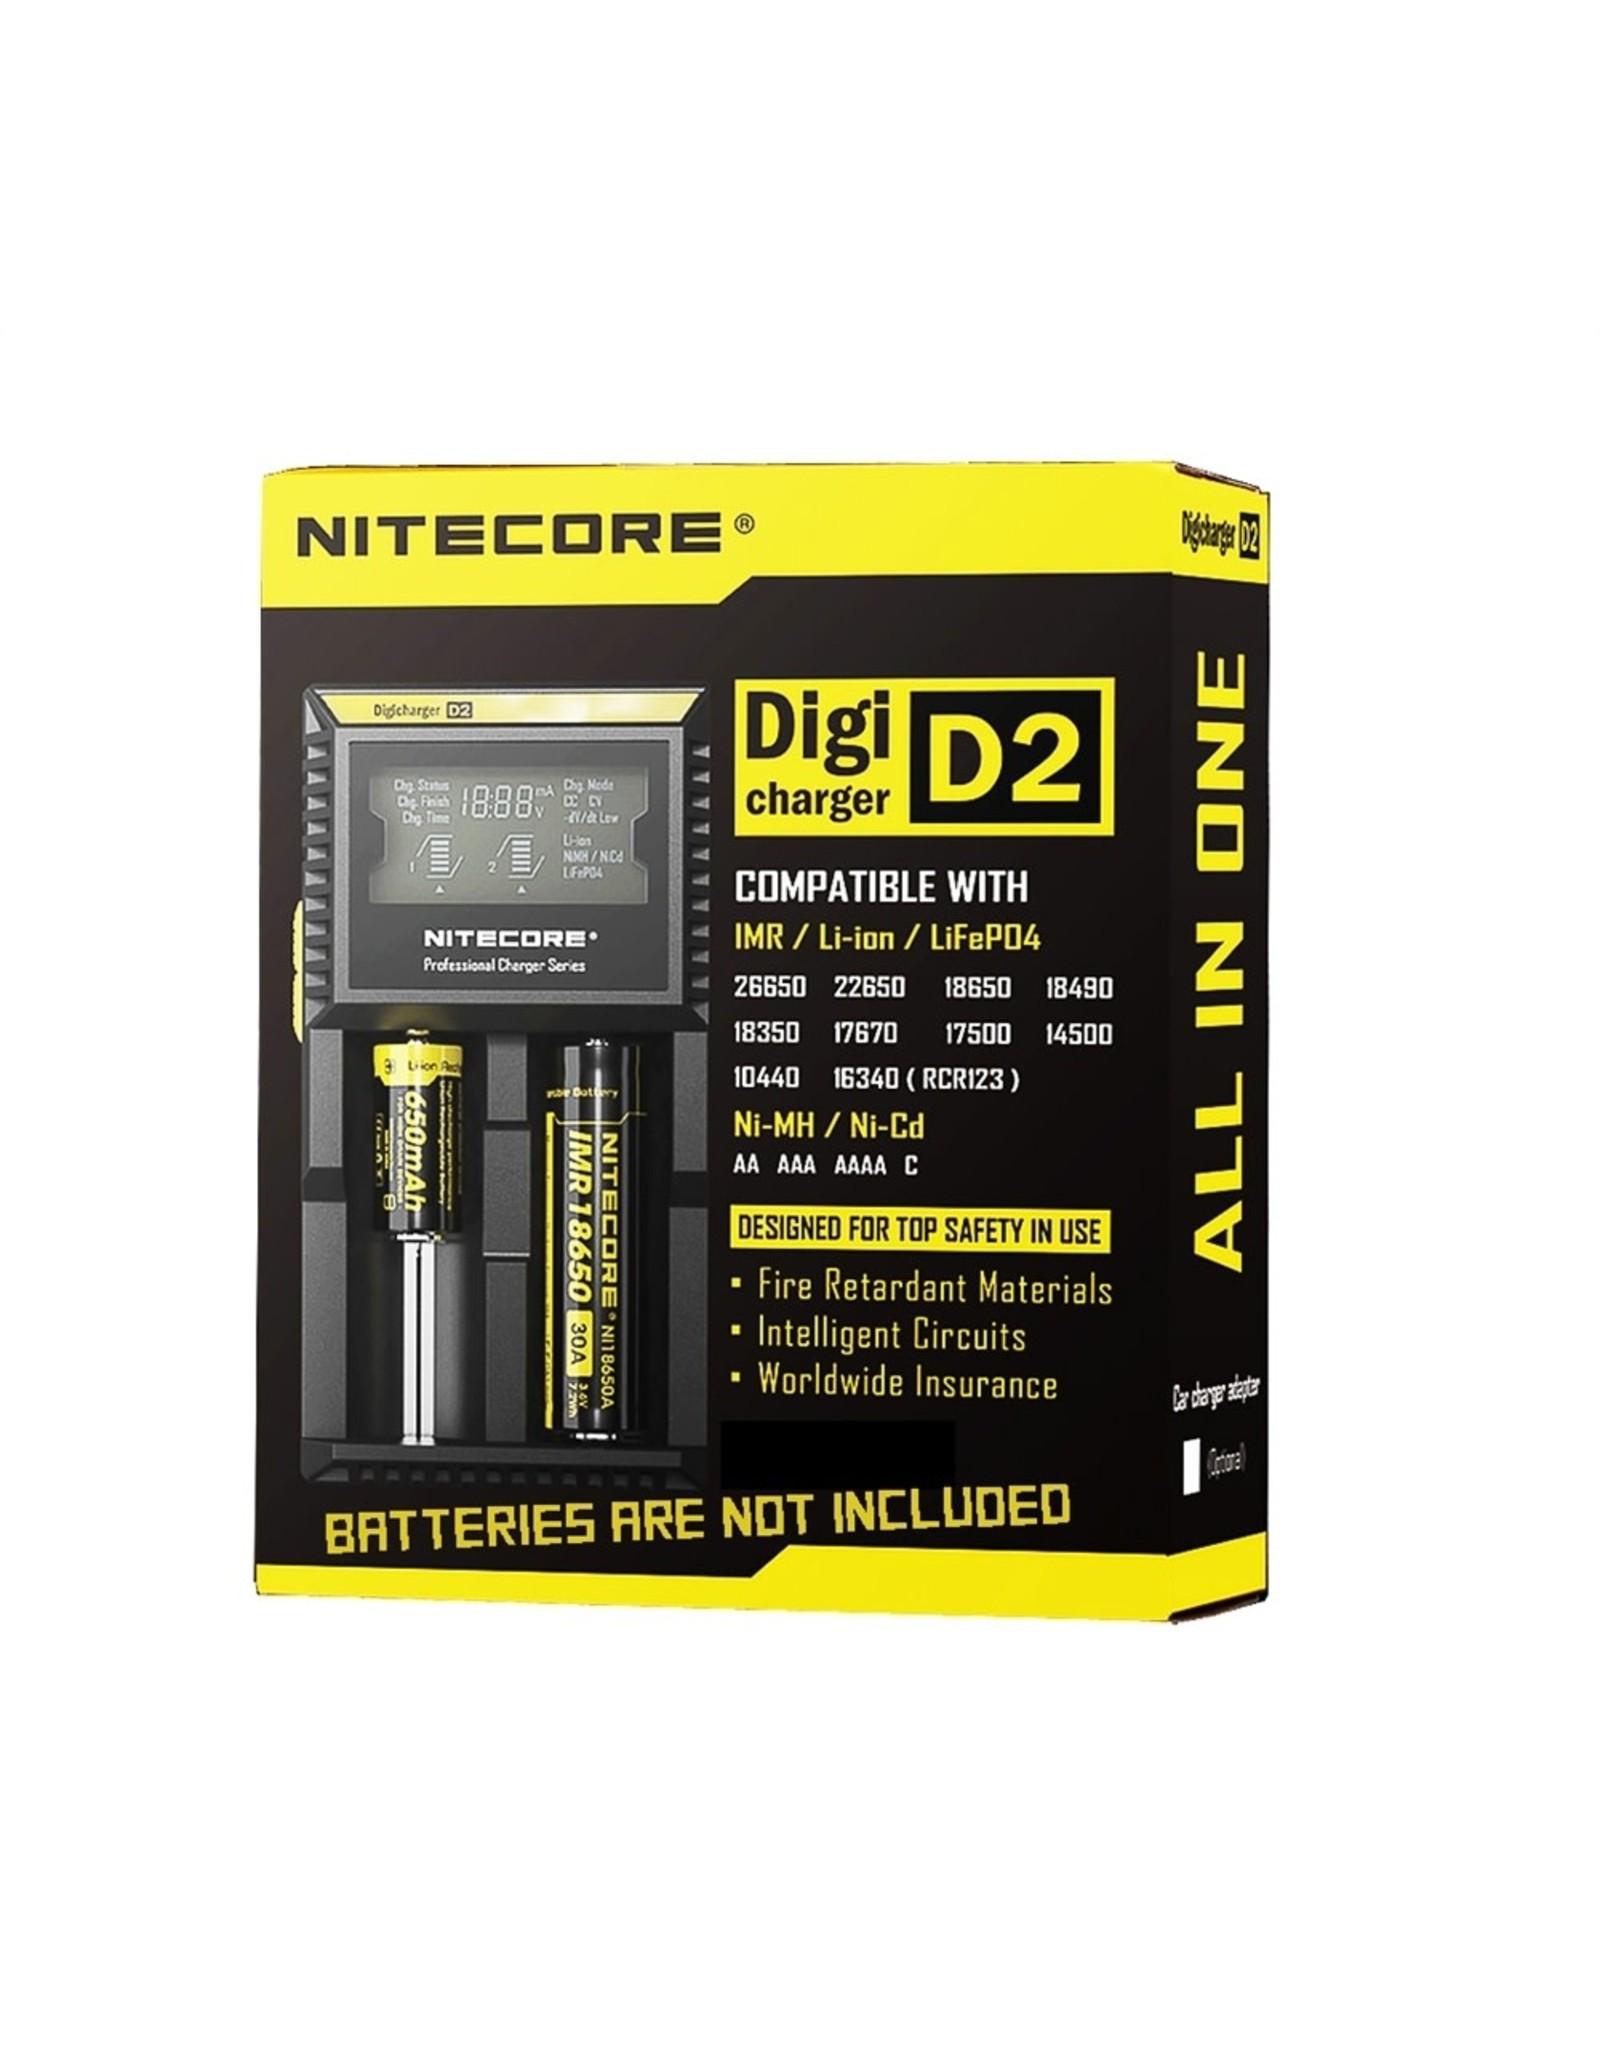 Nitecore Nitecore Digital Charger